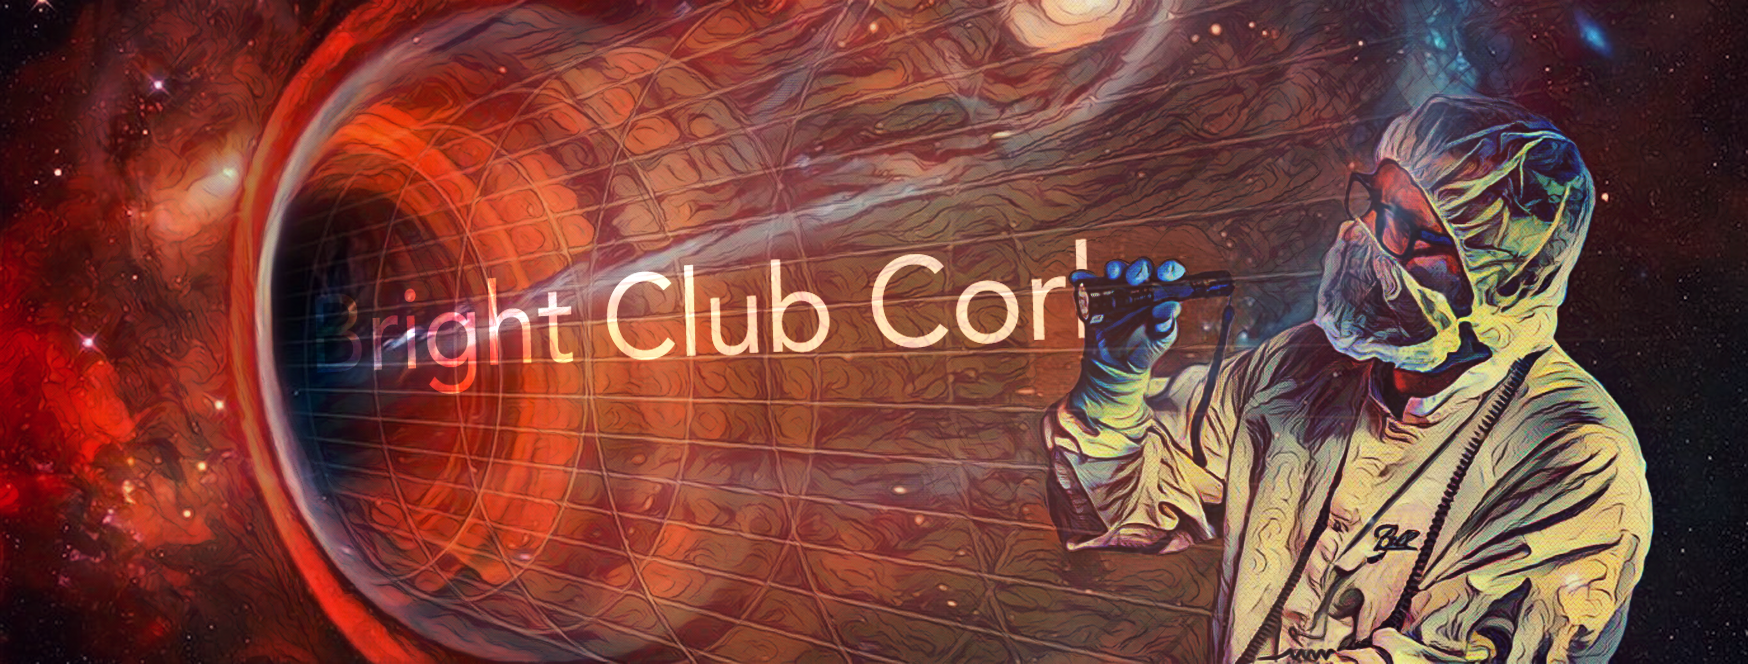 Bright Club Cork